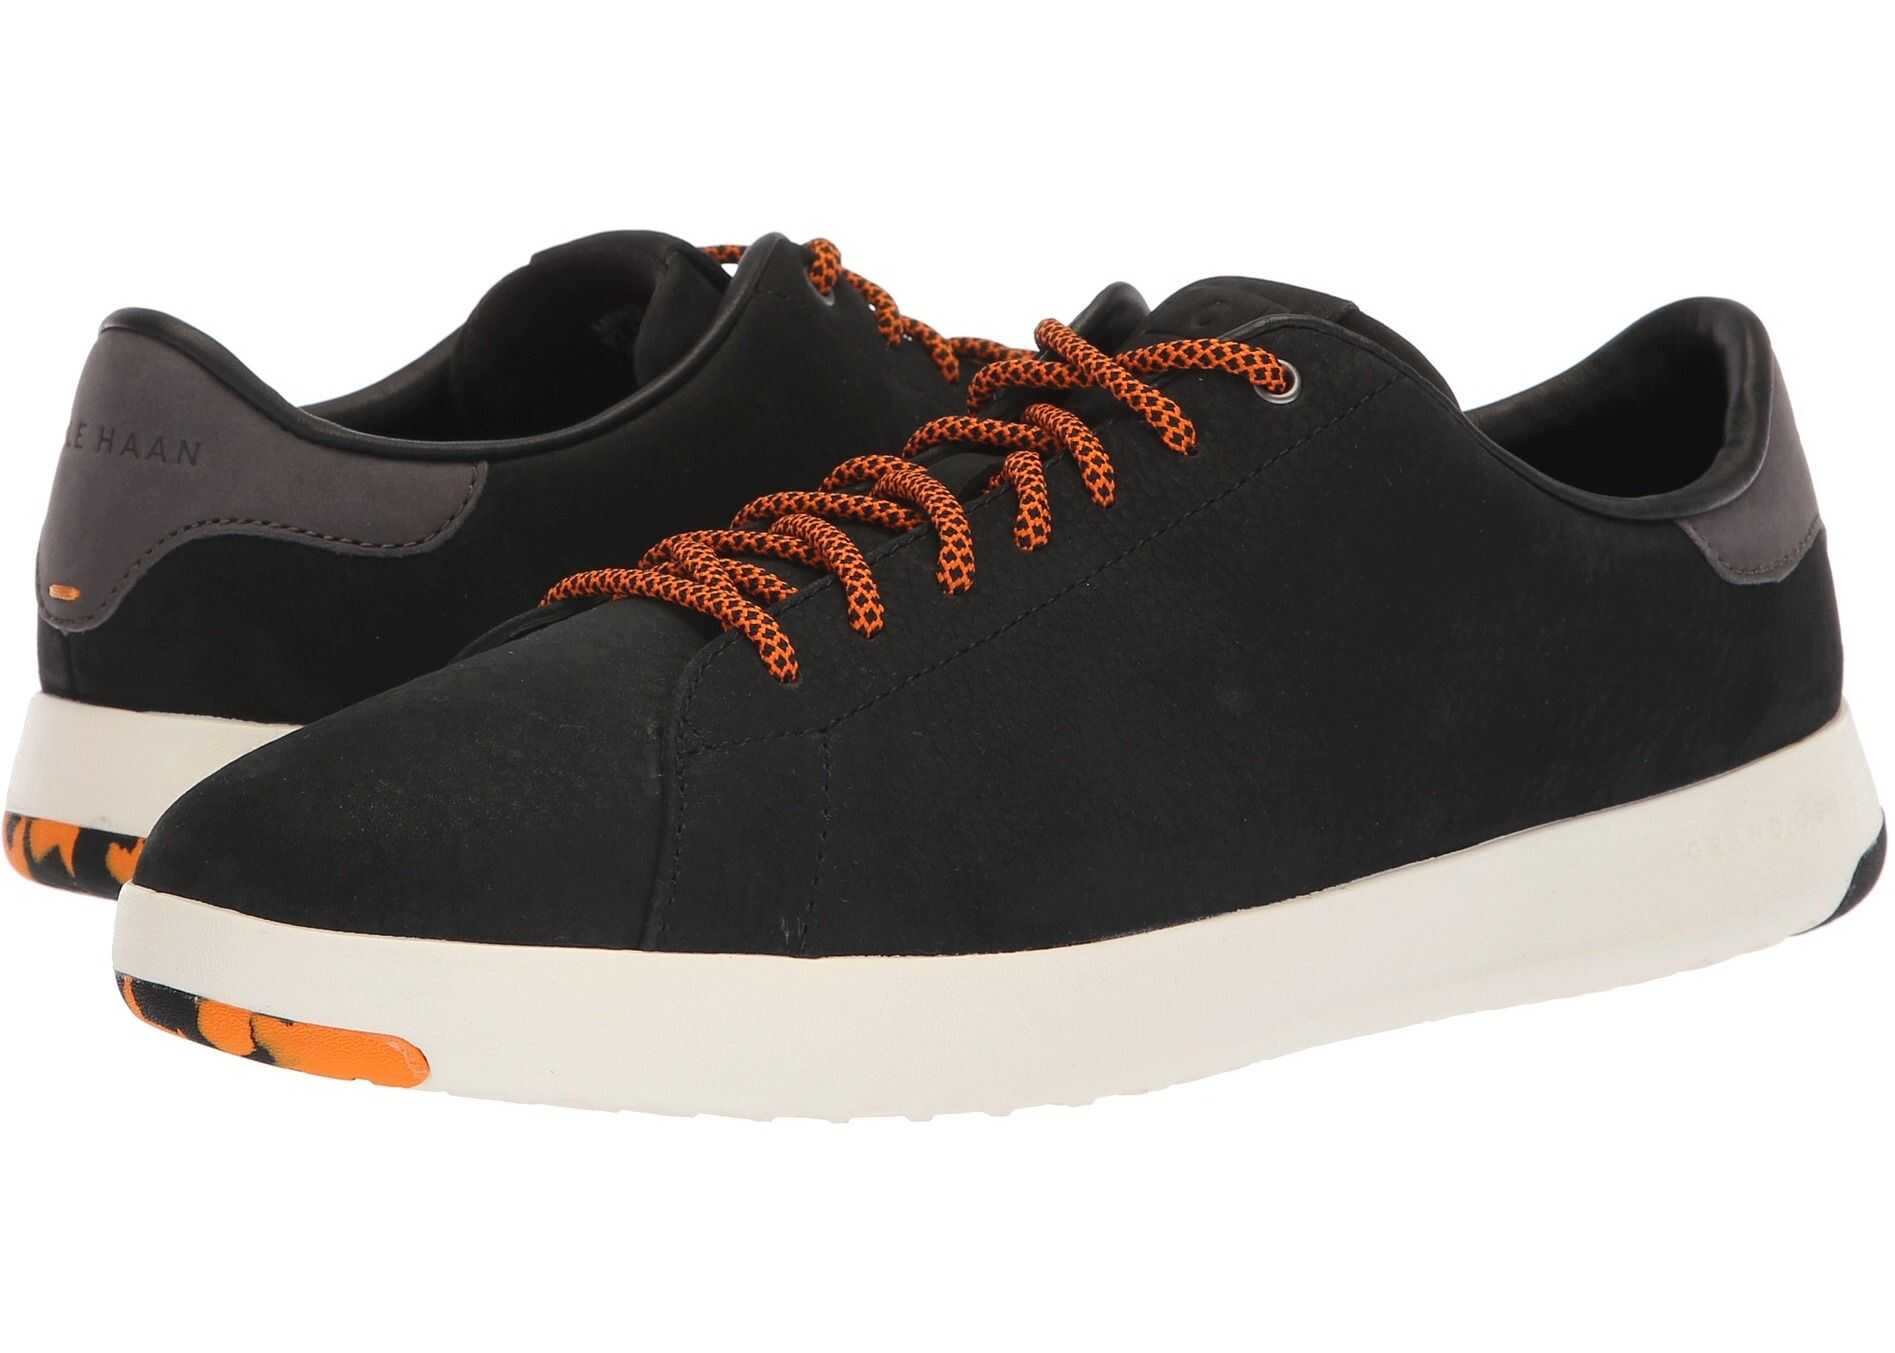 Cole Haan GrandPro Tennis Sneaker Black/Tumeric